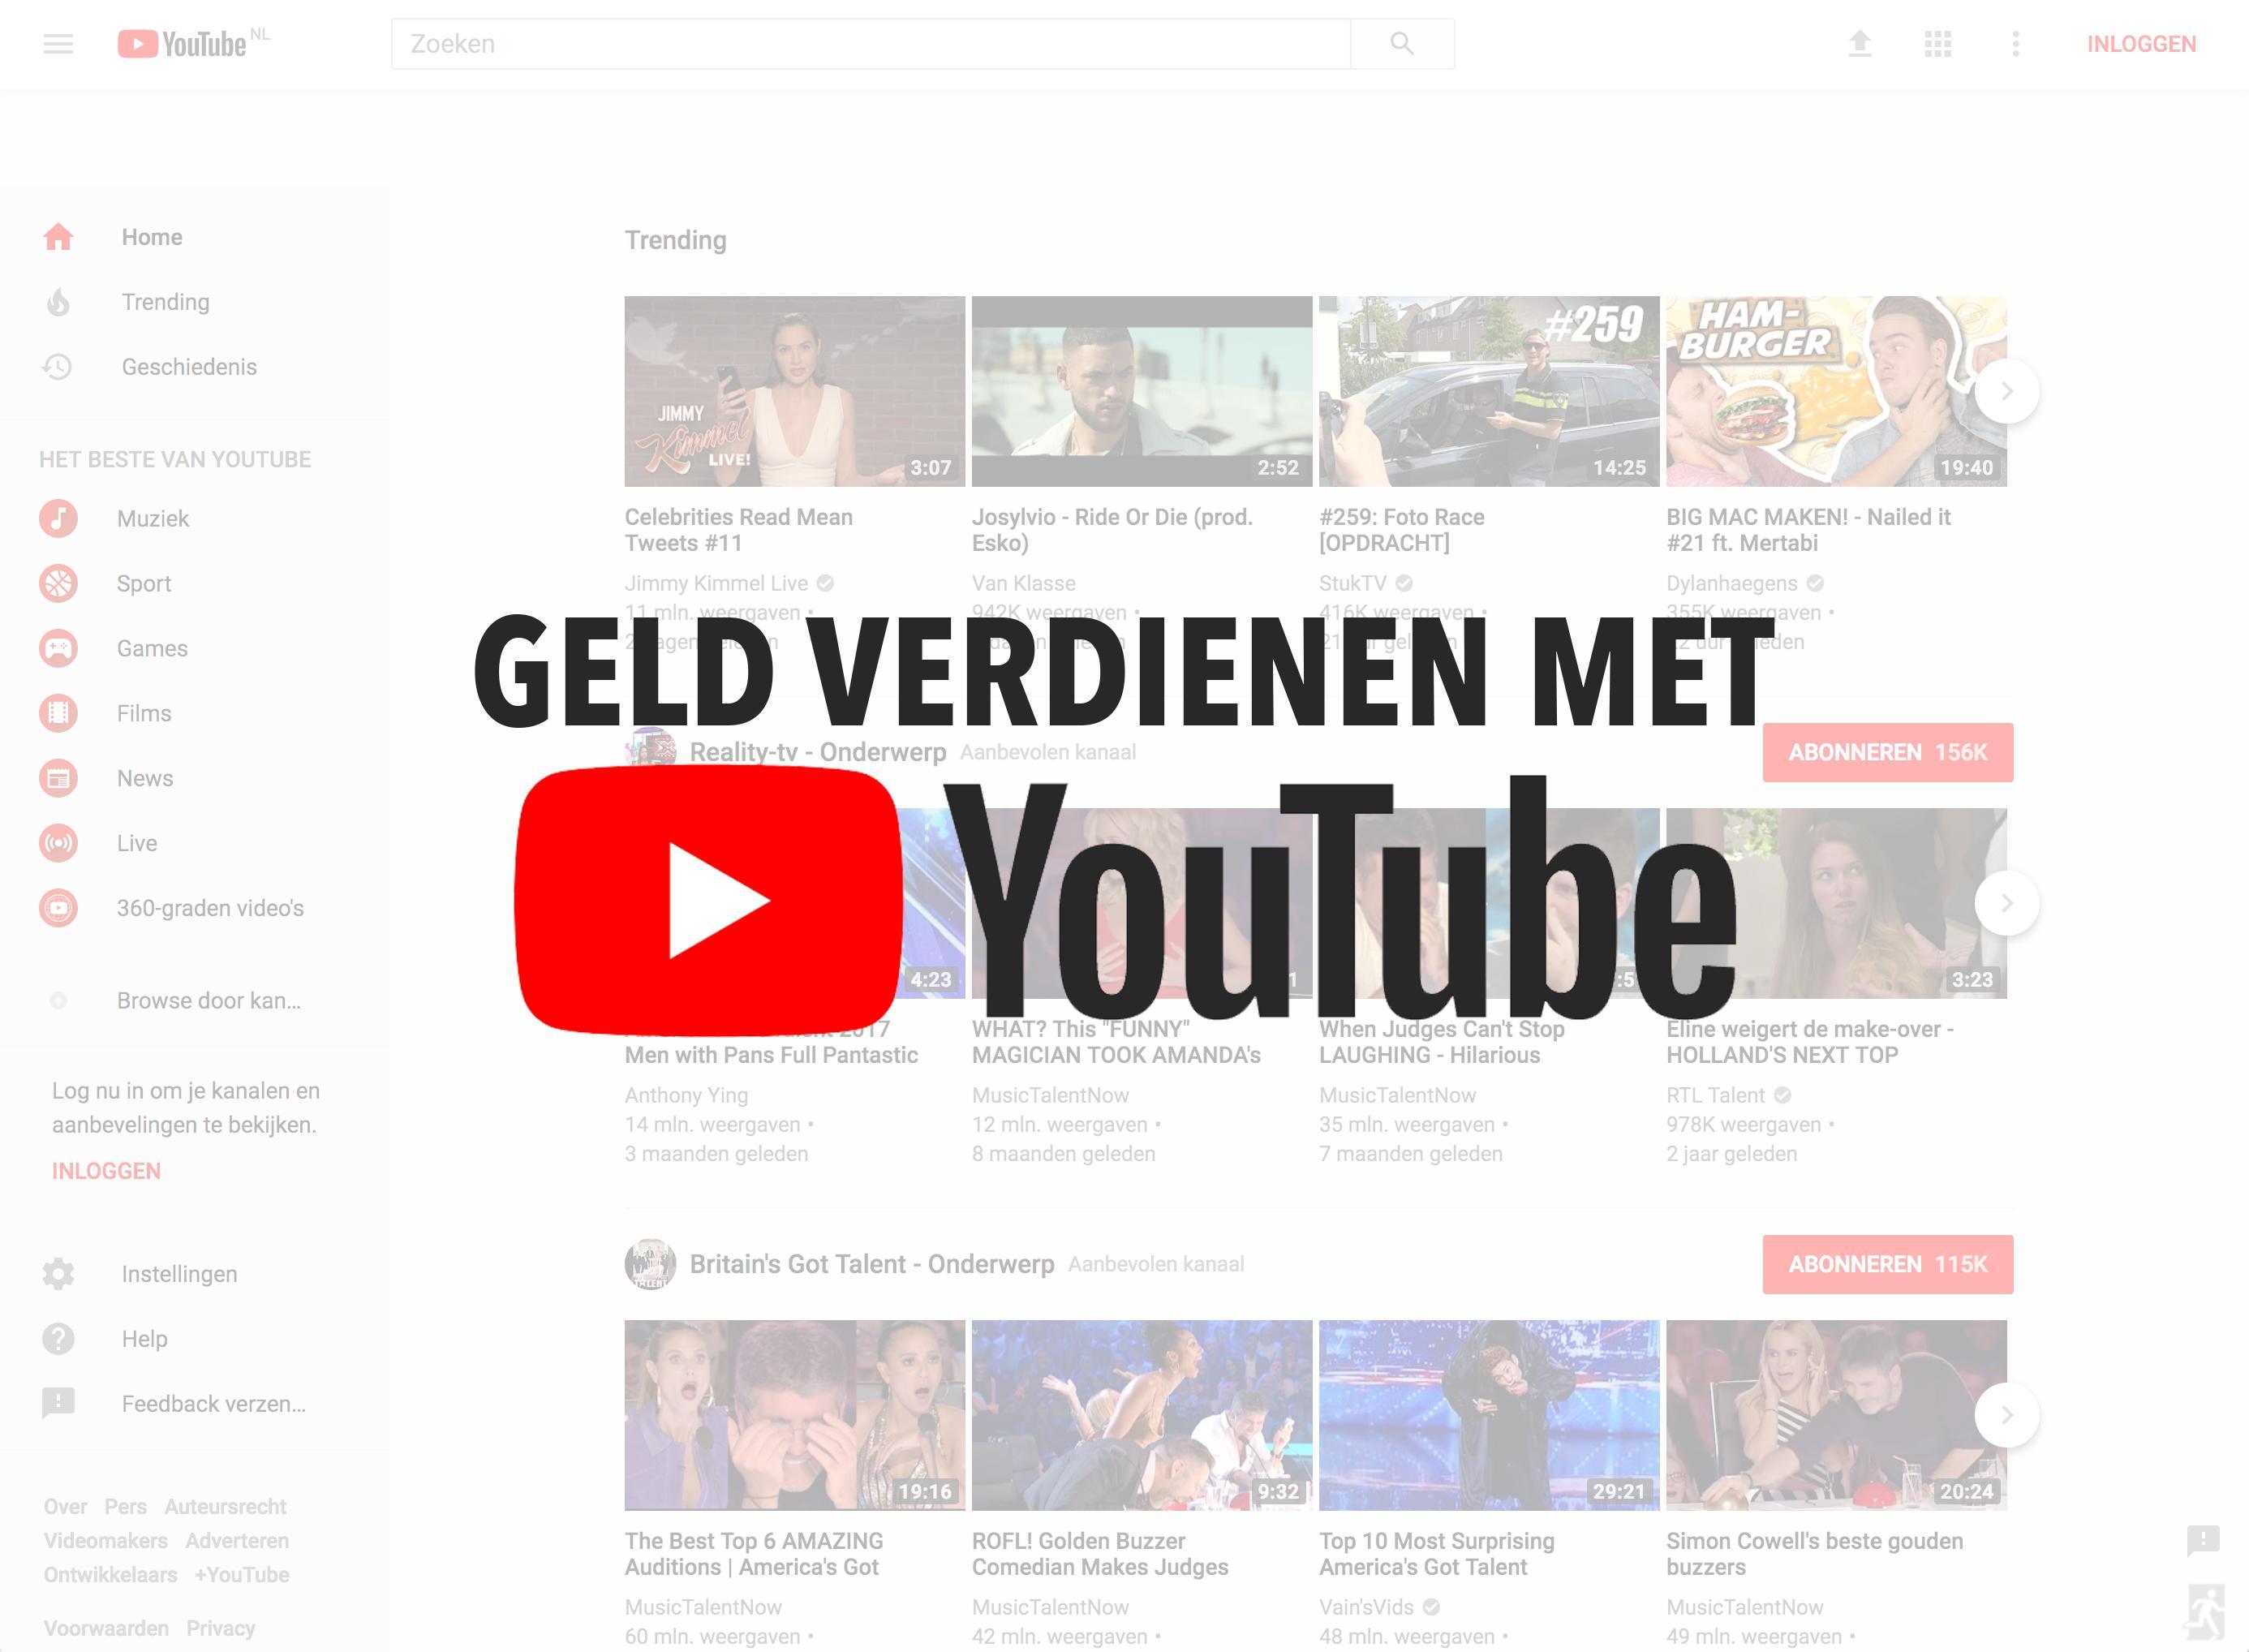 Hoeveel verdien je met 1 miljoen views op YouTube?